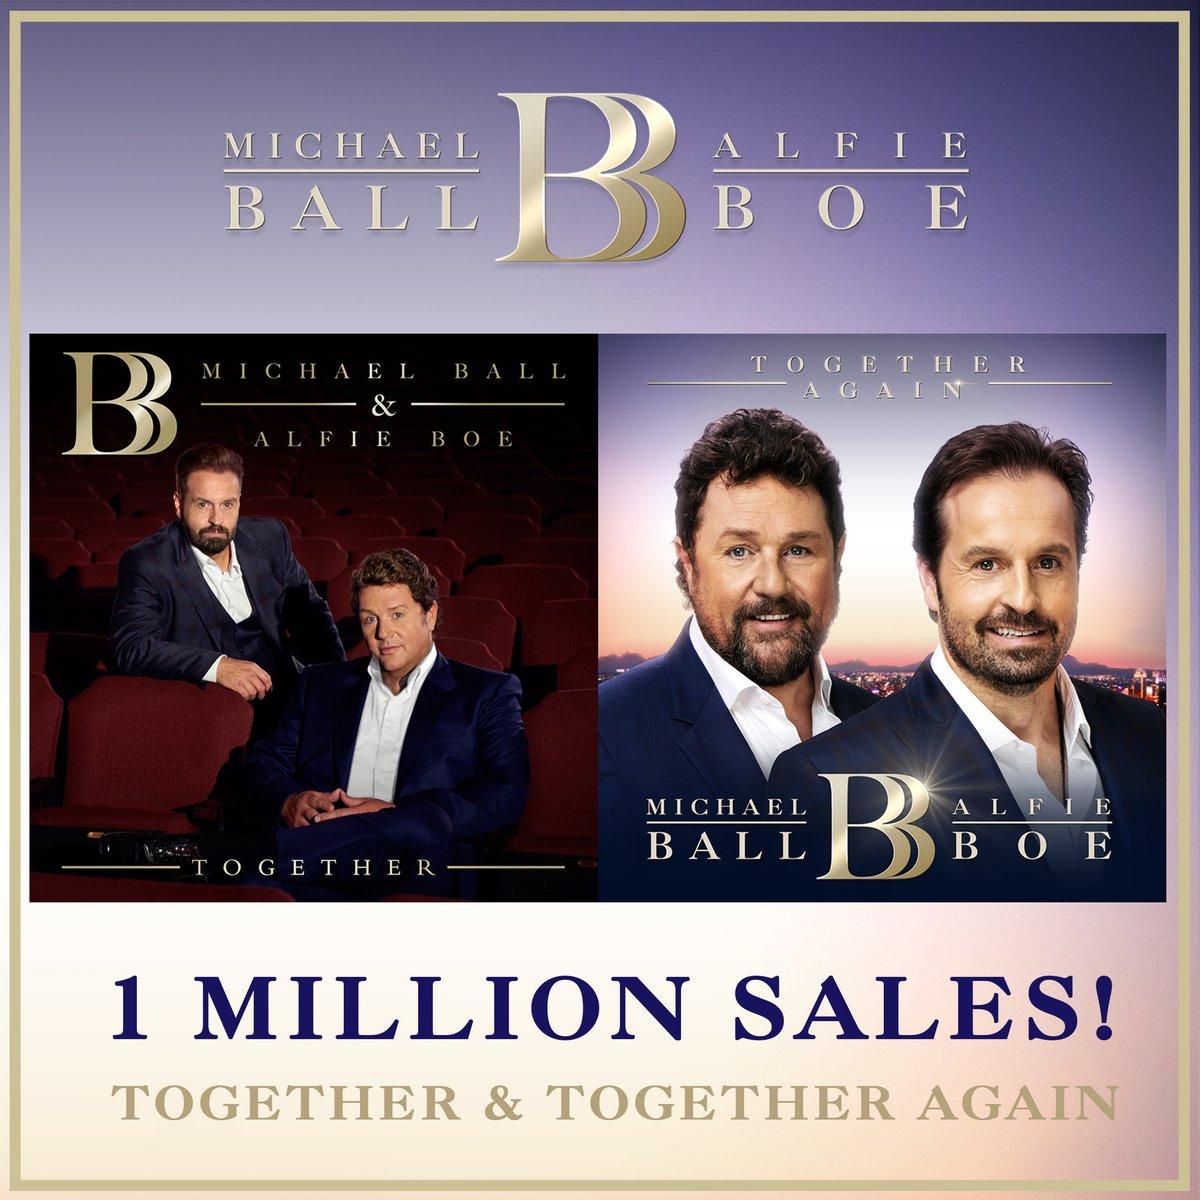 1 million sold albums!